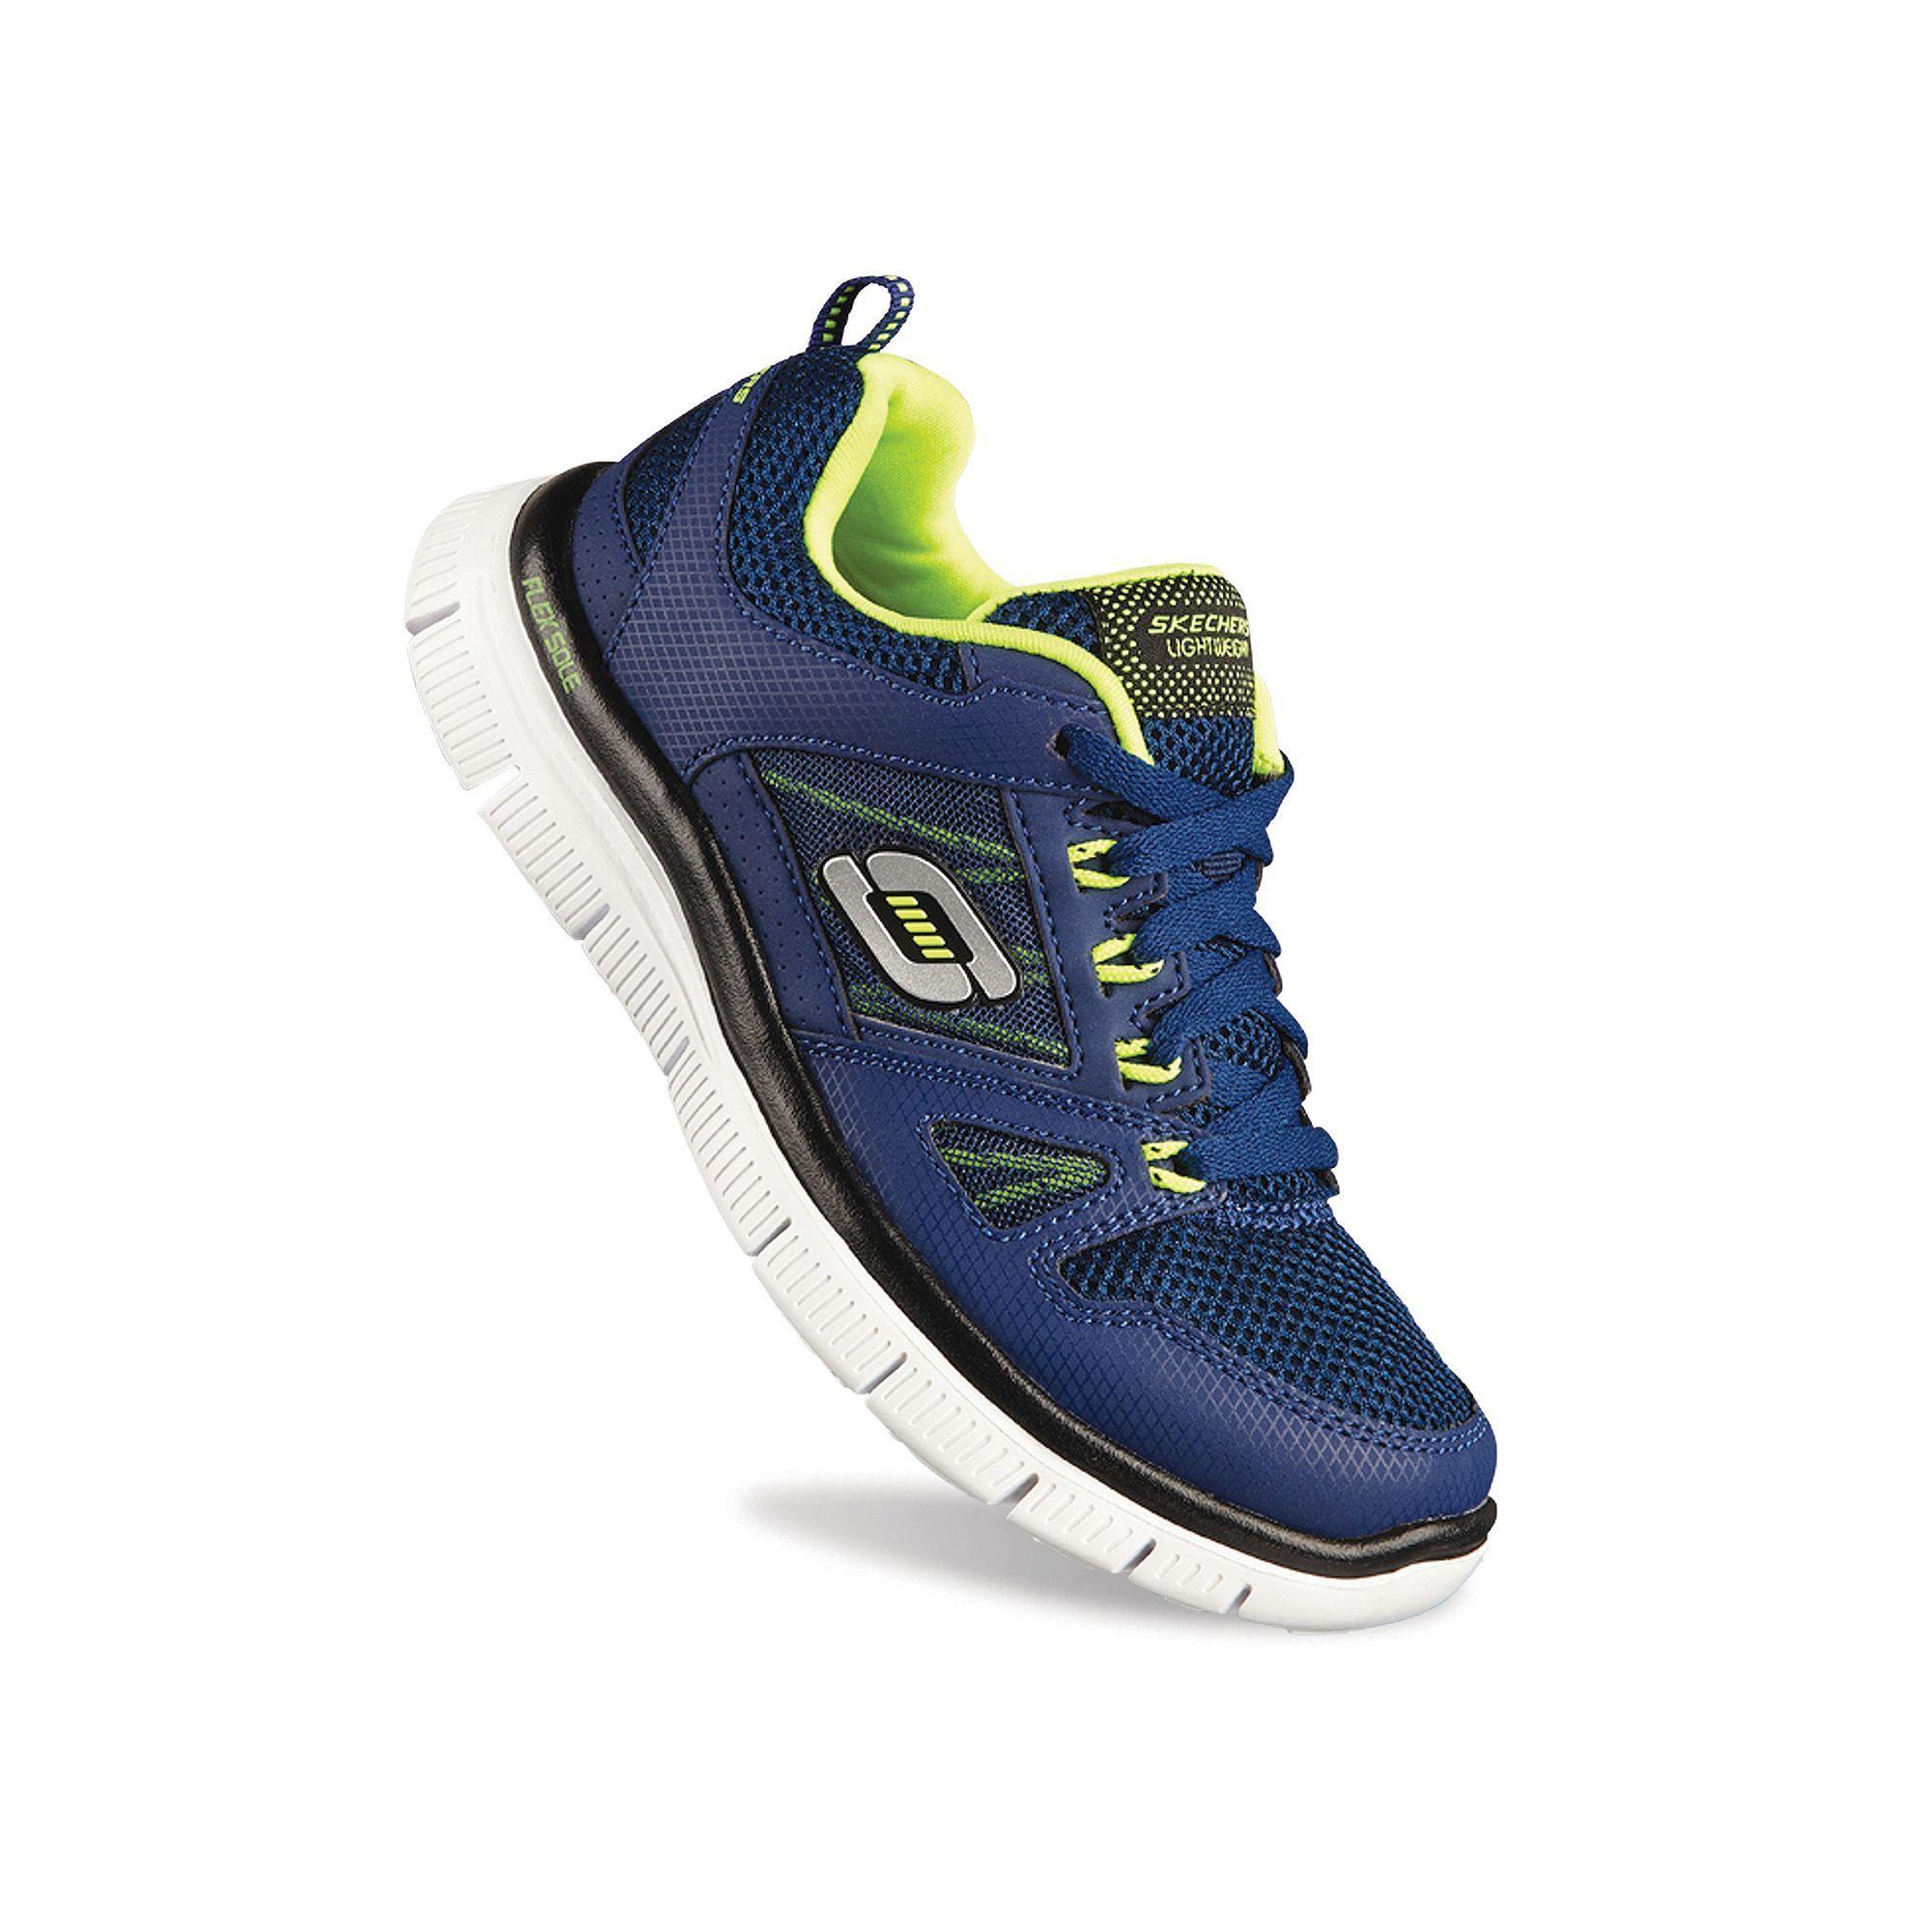 Nike Free Run 3 Dimensionnement Dun Générateur